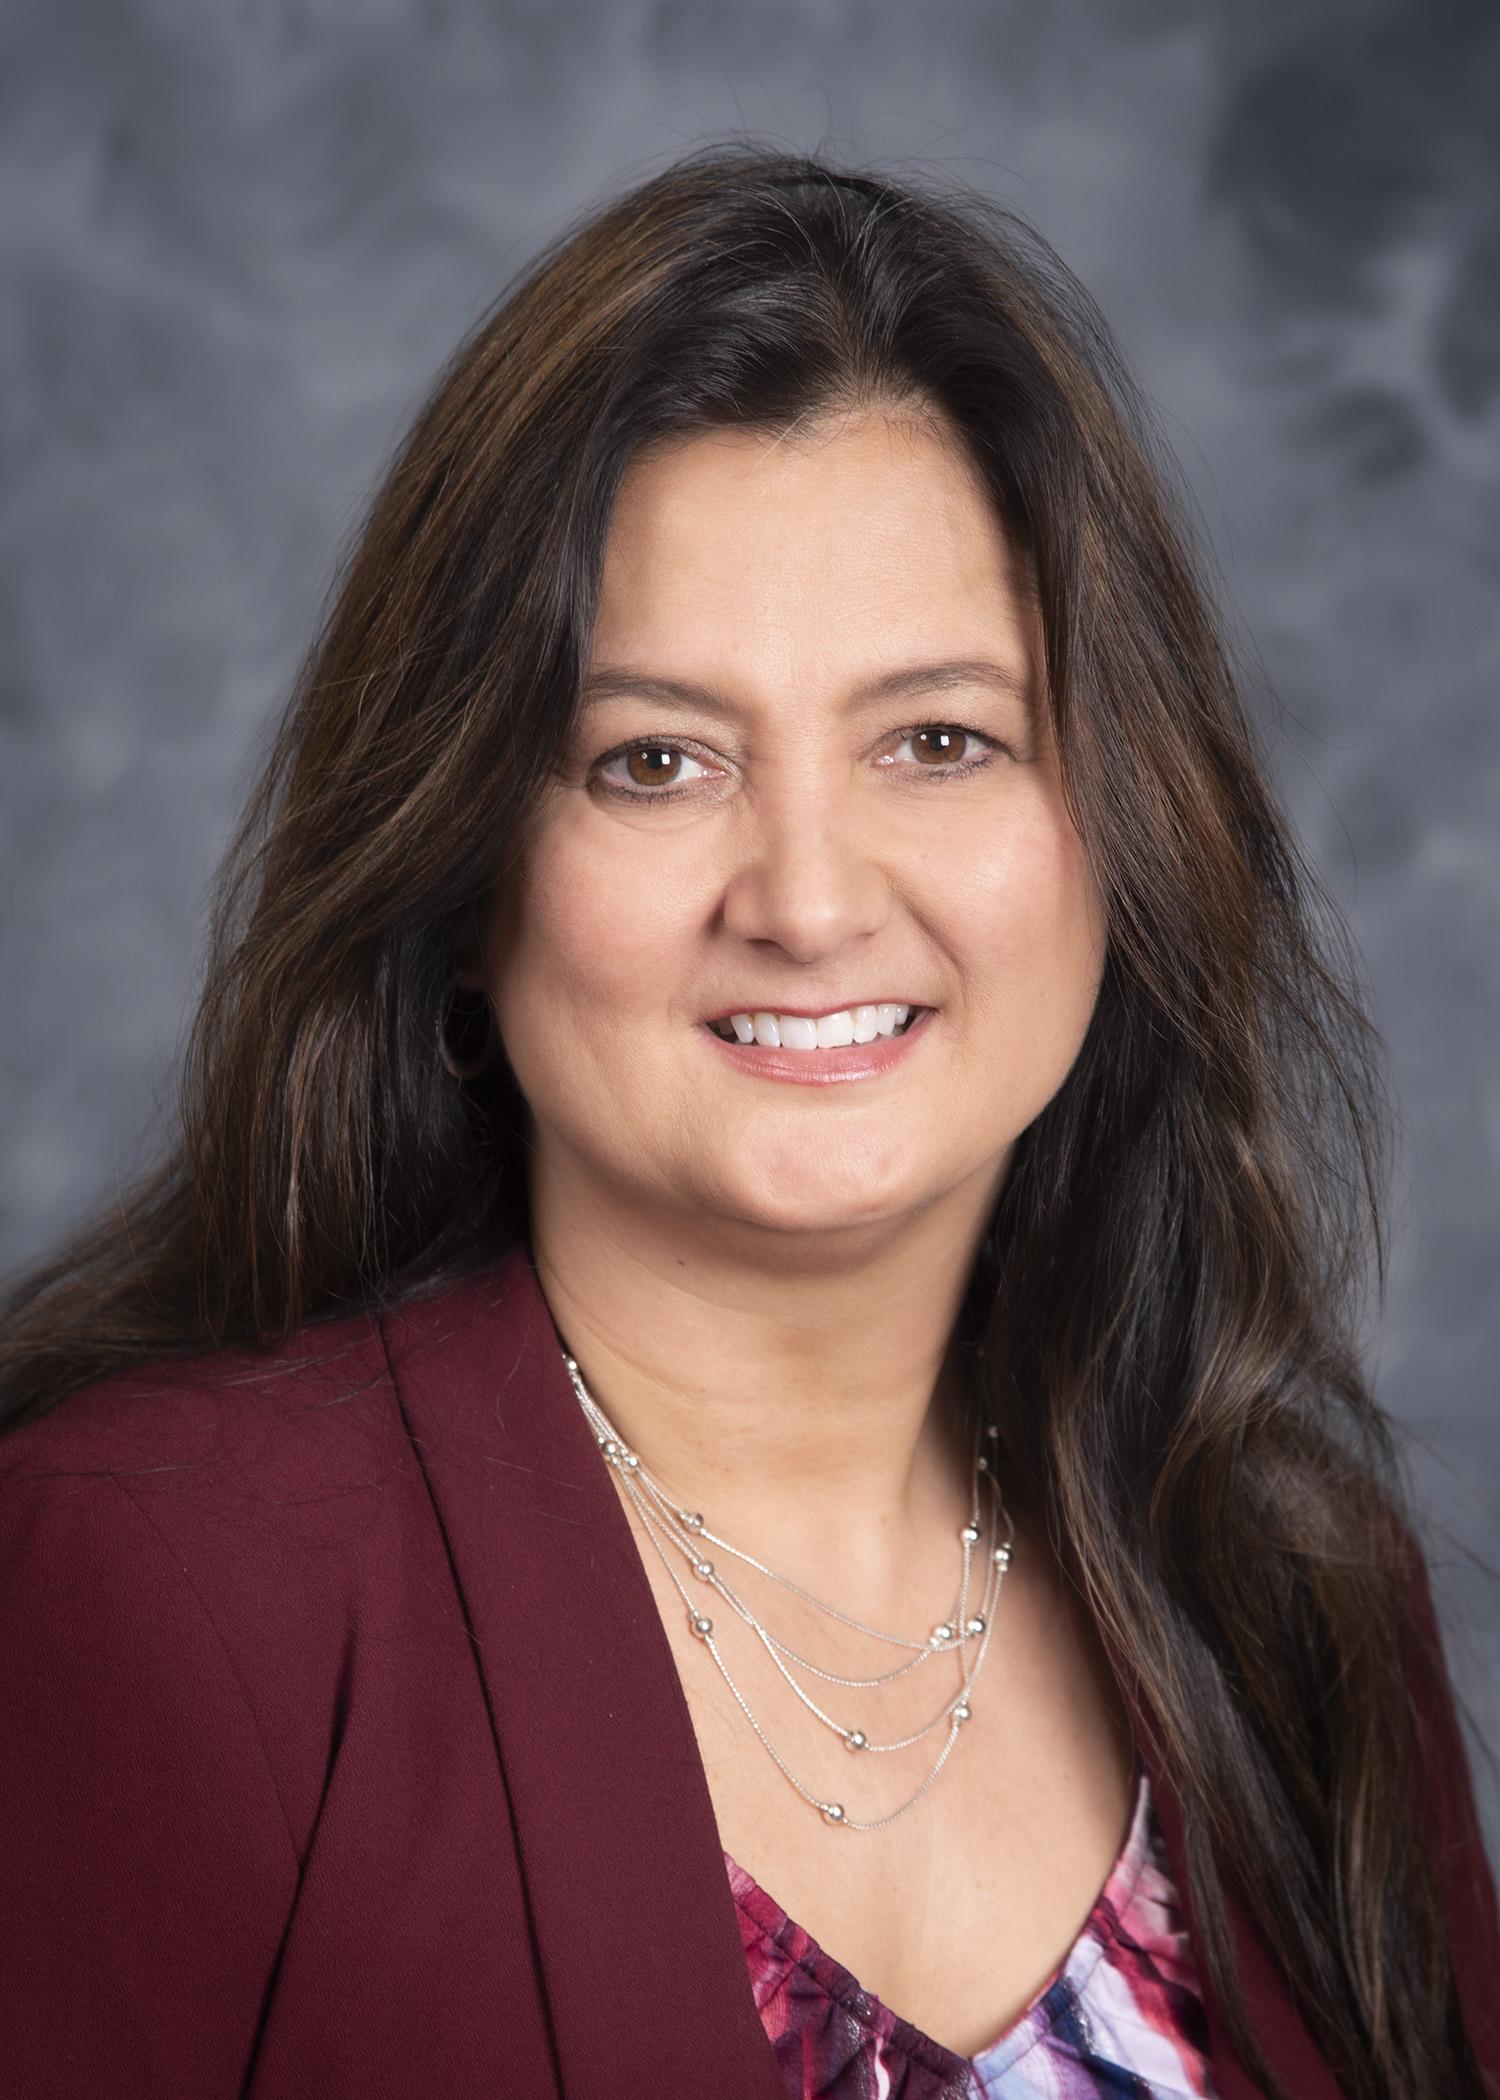 Dr. Carla Huston